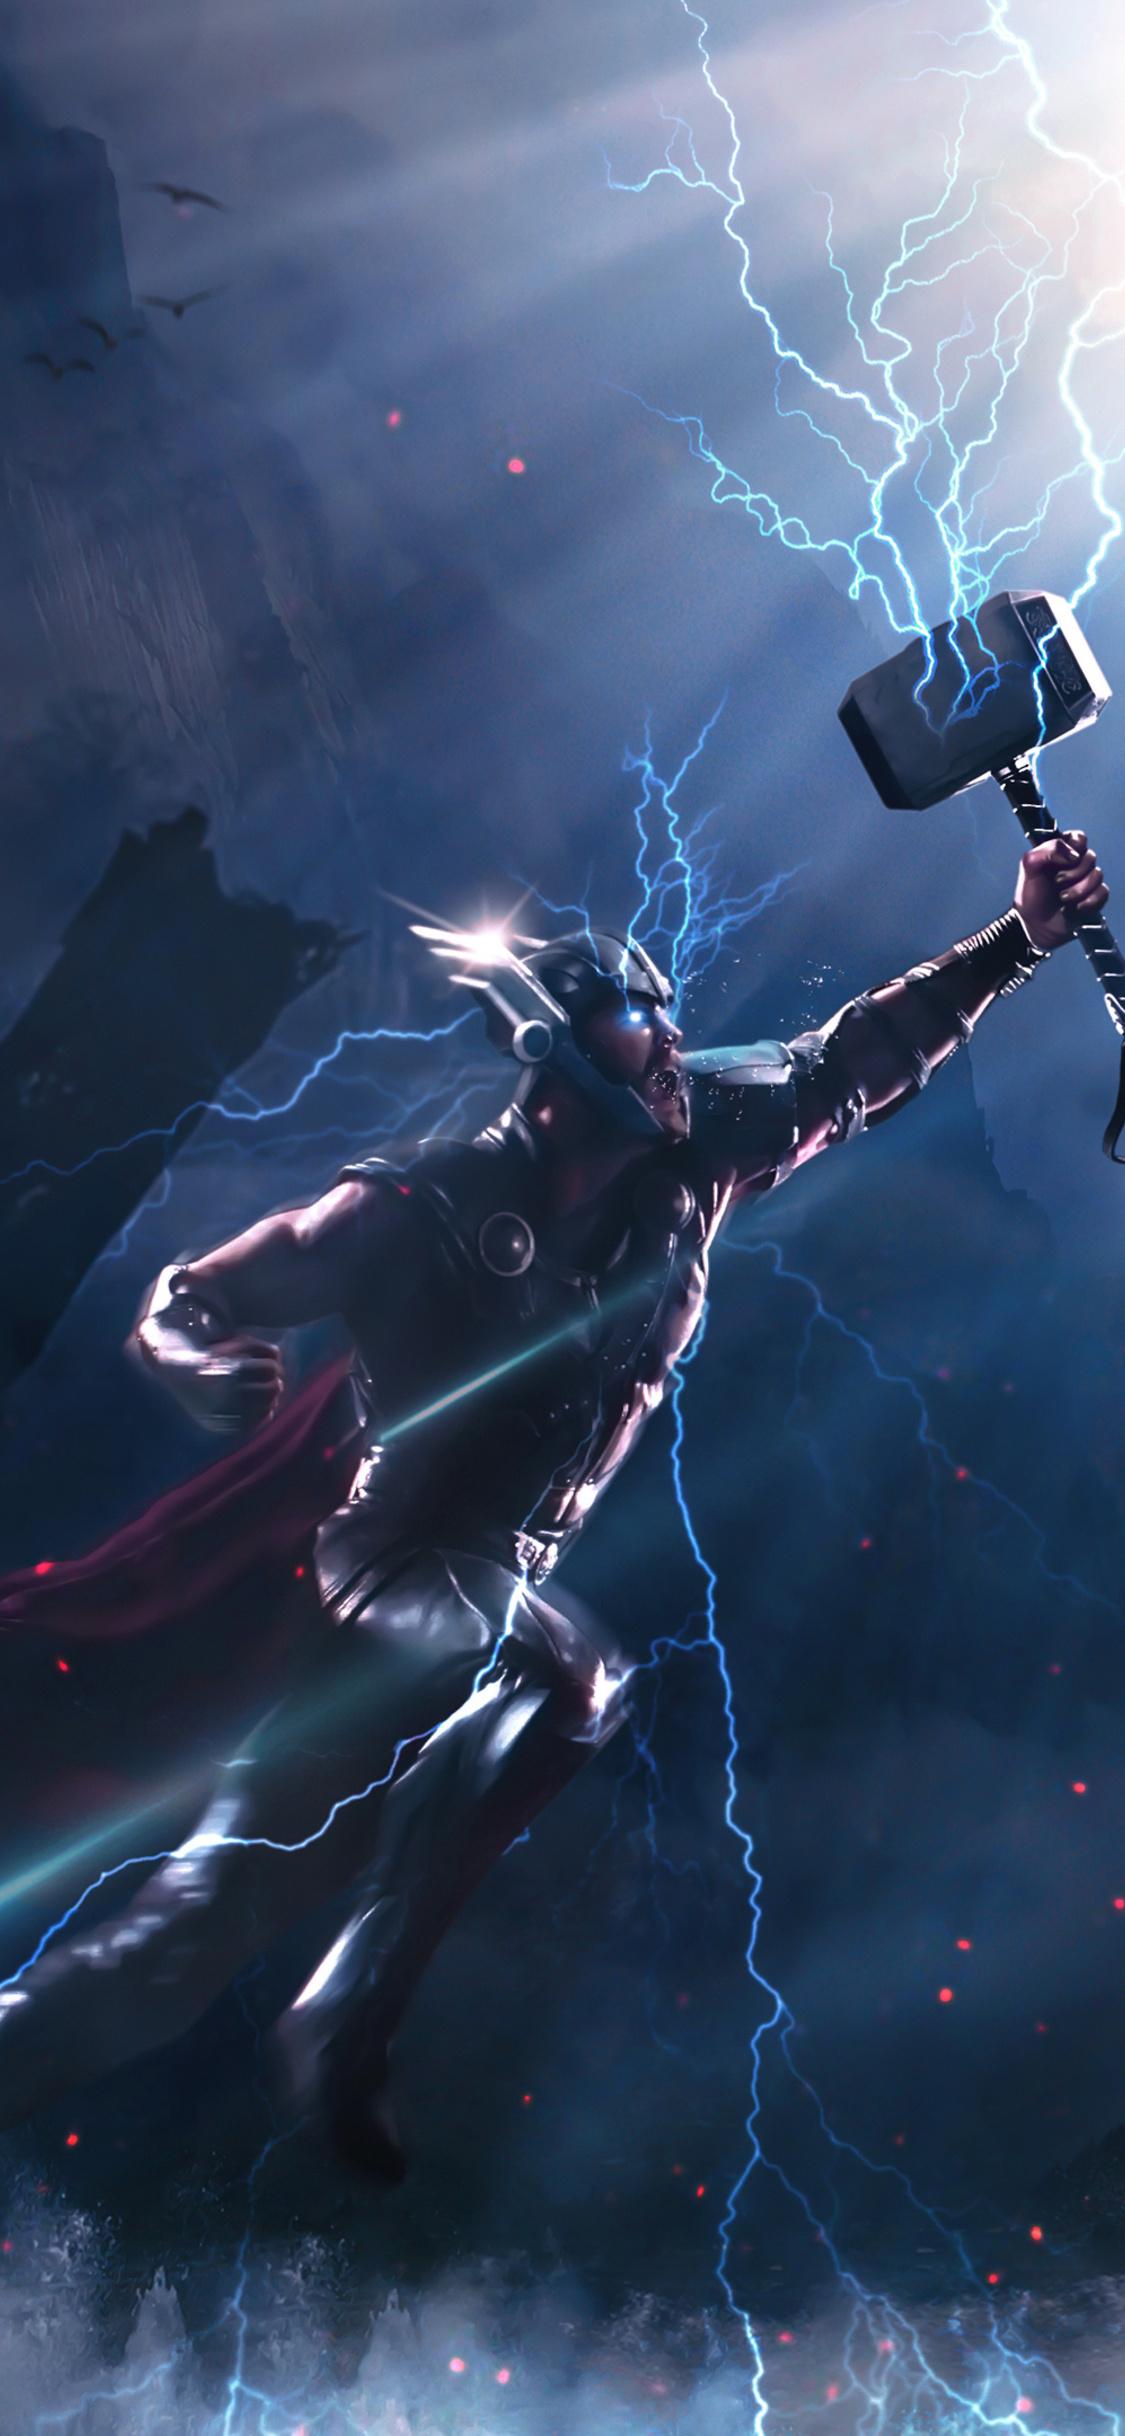 1125x2436 Thor Vs Kratos 4k Iphone Xsiphone 10iphone X Hd